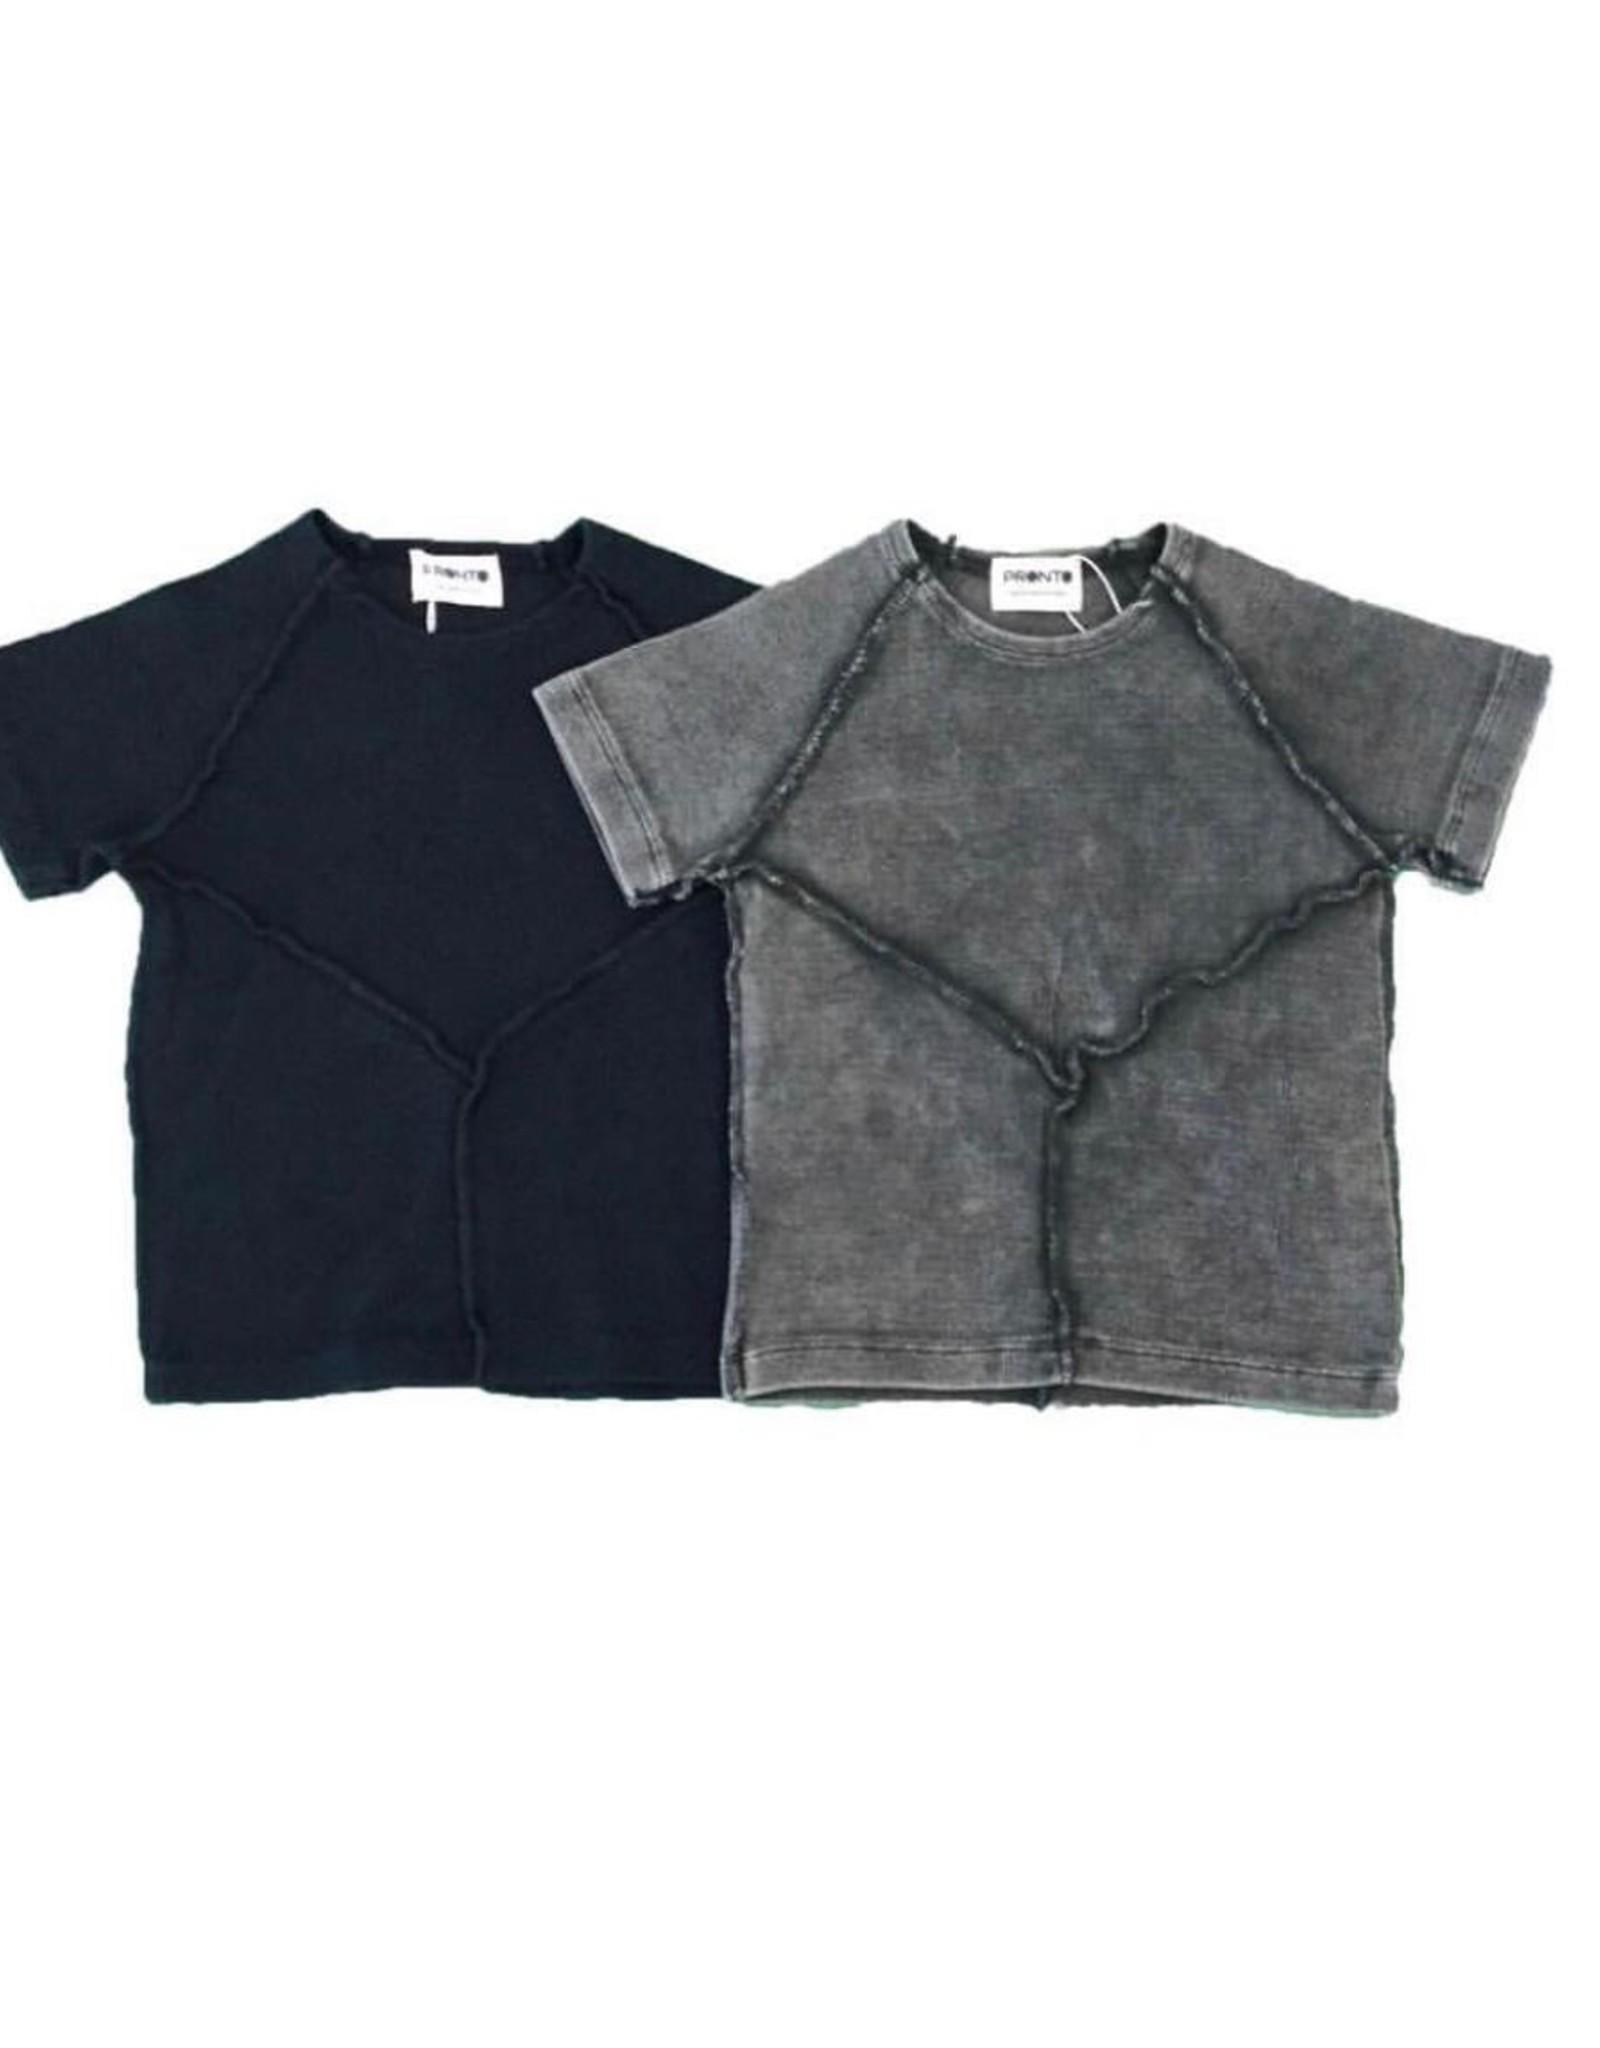 Pronto Pronto Boys Rib Top with Stitch Detail